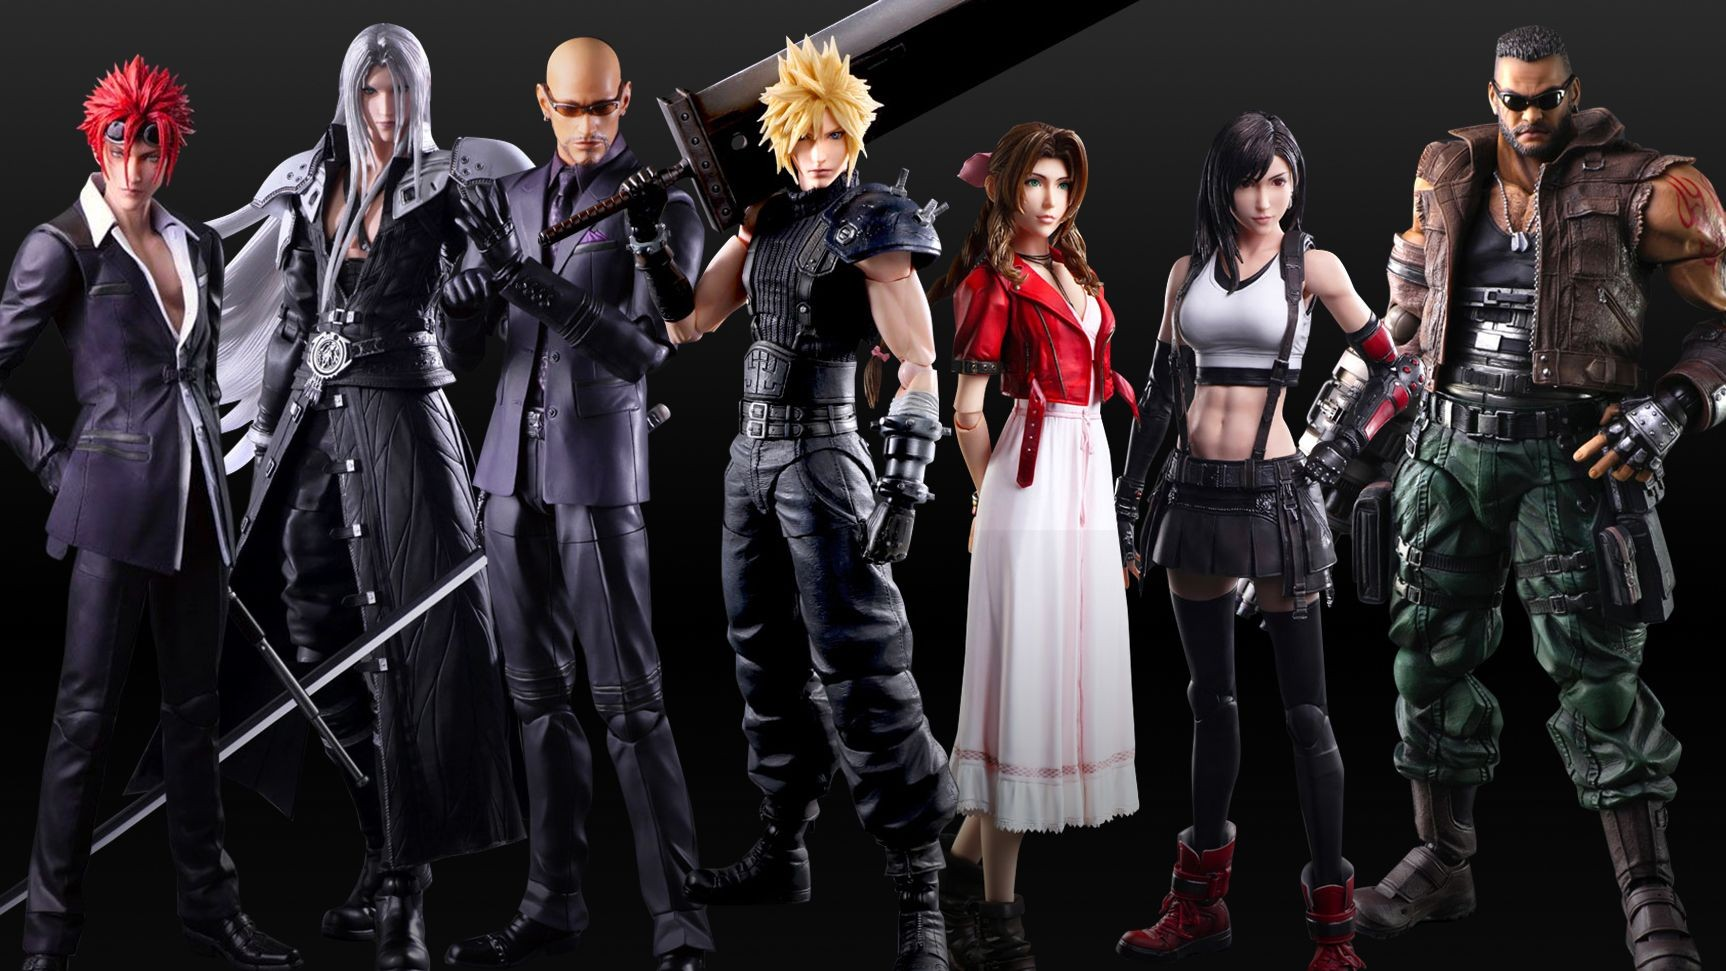 Final Fantasy VII Remake Play Arts line adds Reno, Rude and Sephiroth screenshot